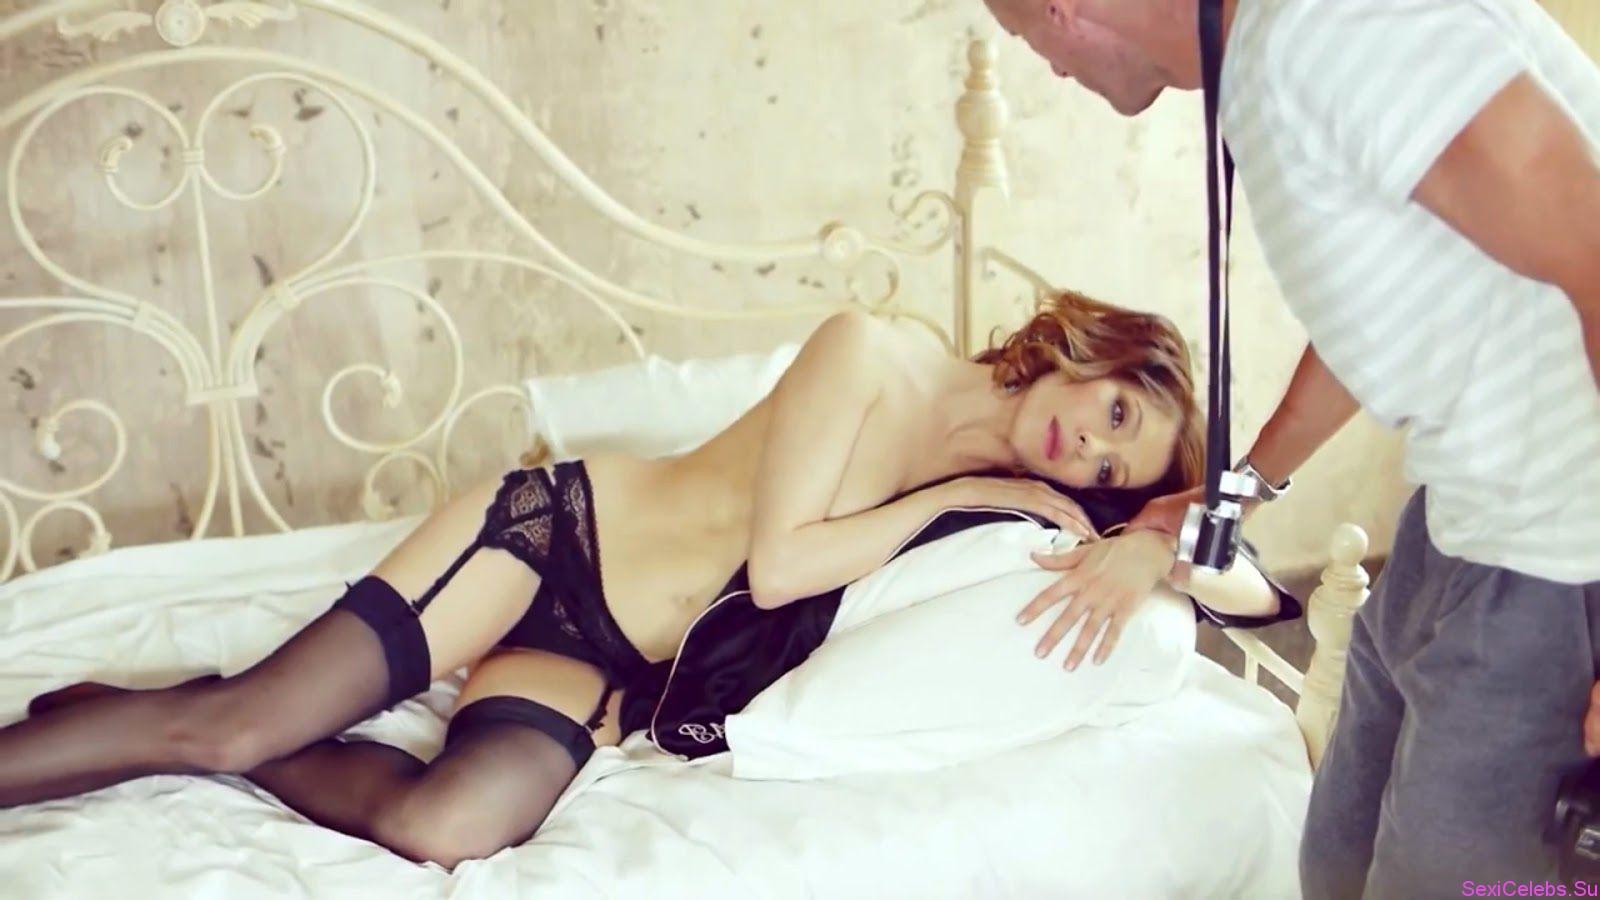 Елена подкаминская эротические фото одно тоже